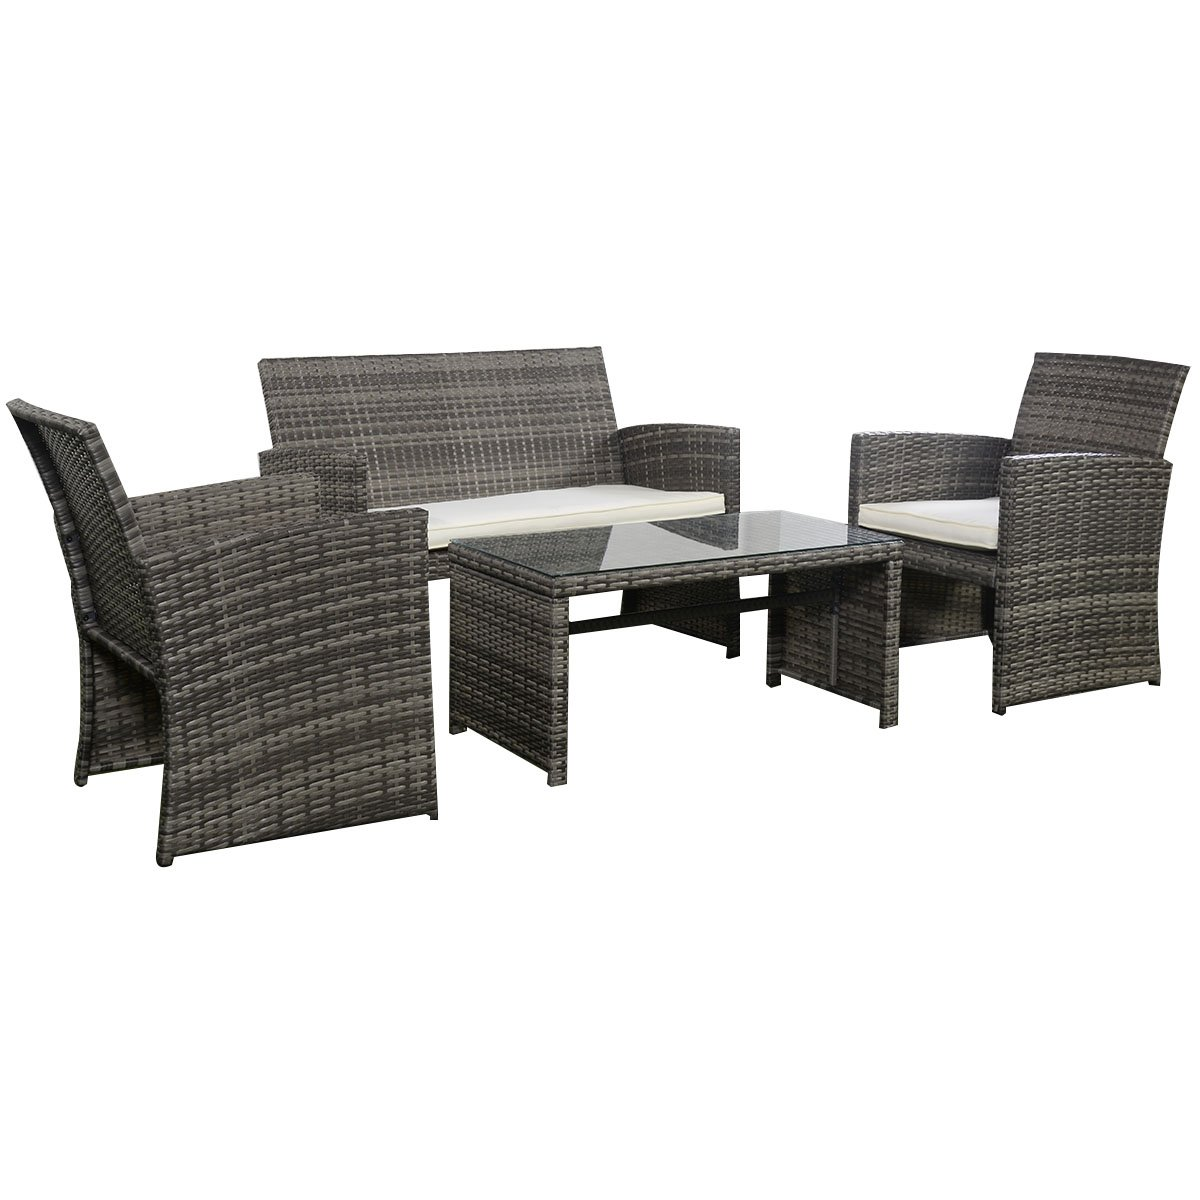 Goplus 4 PC Rattan Patio Furniture Set Garden Lawn Sofa Cushioned Seat Wicker Sofa (Mix Gray) by Goplus